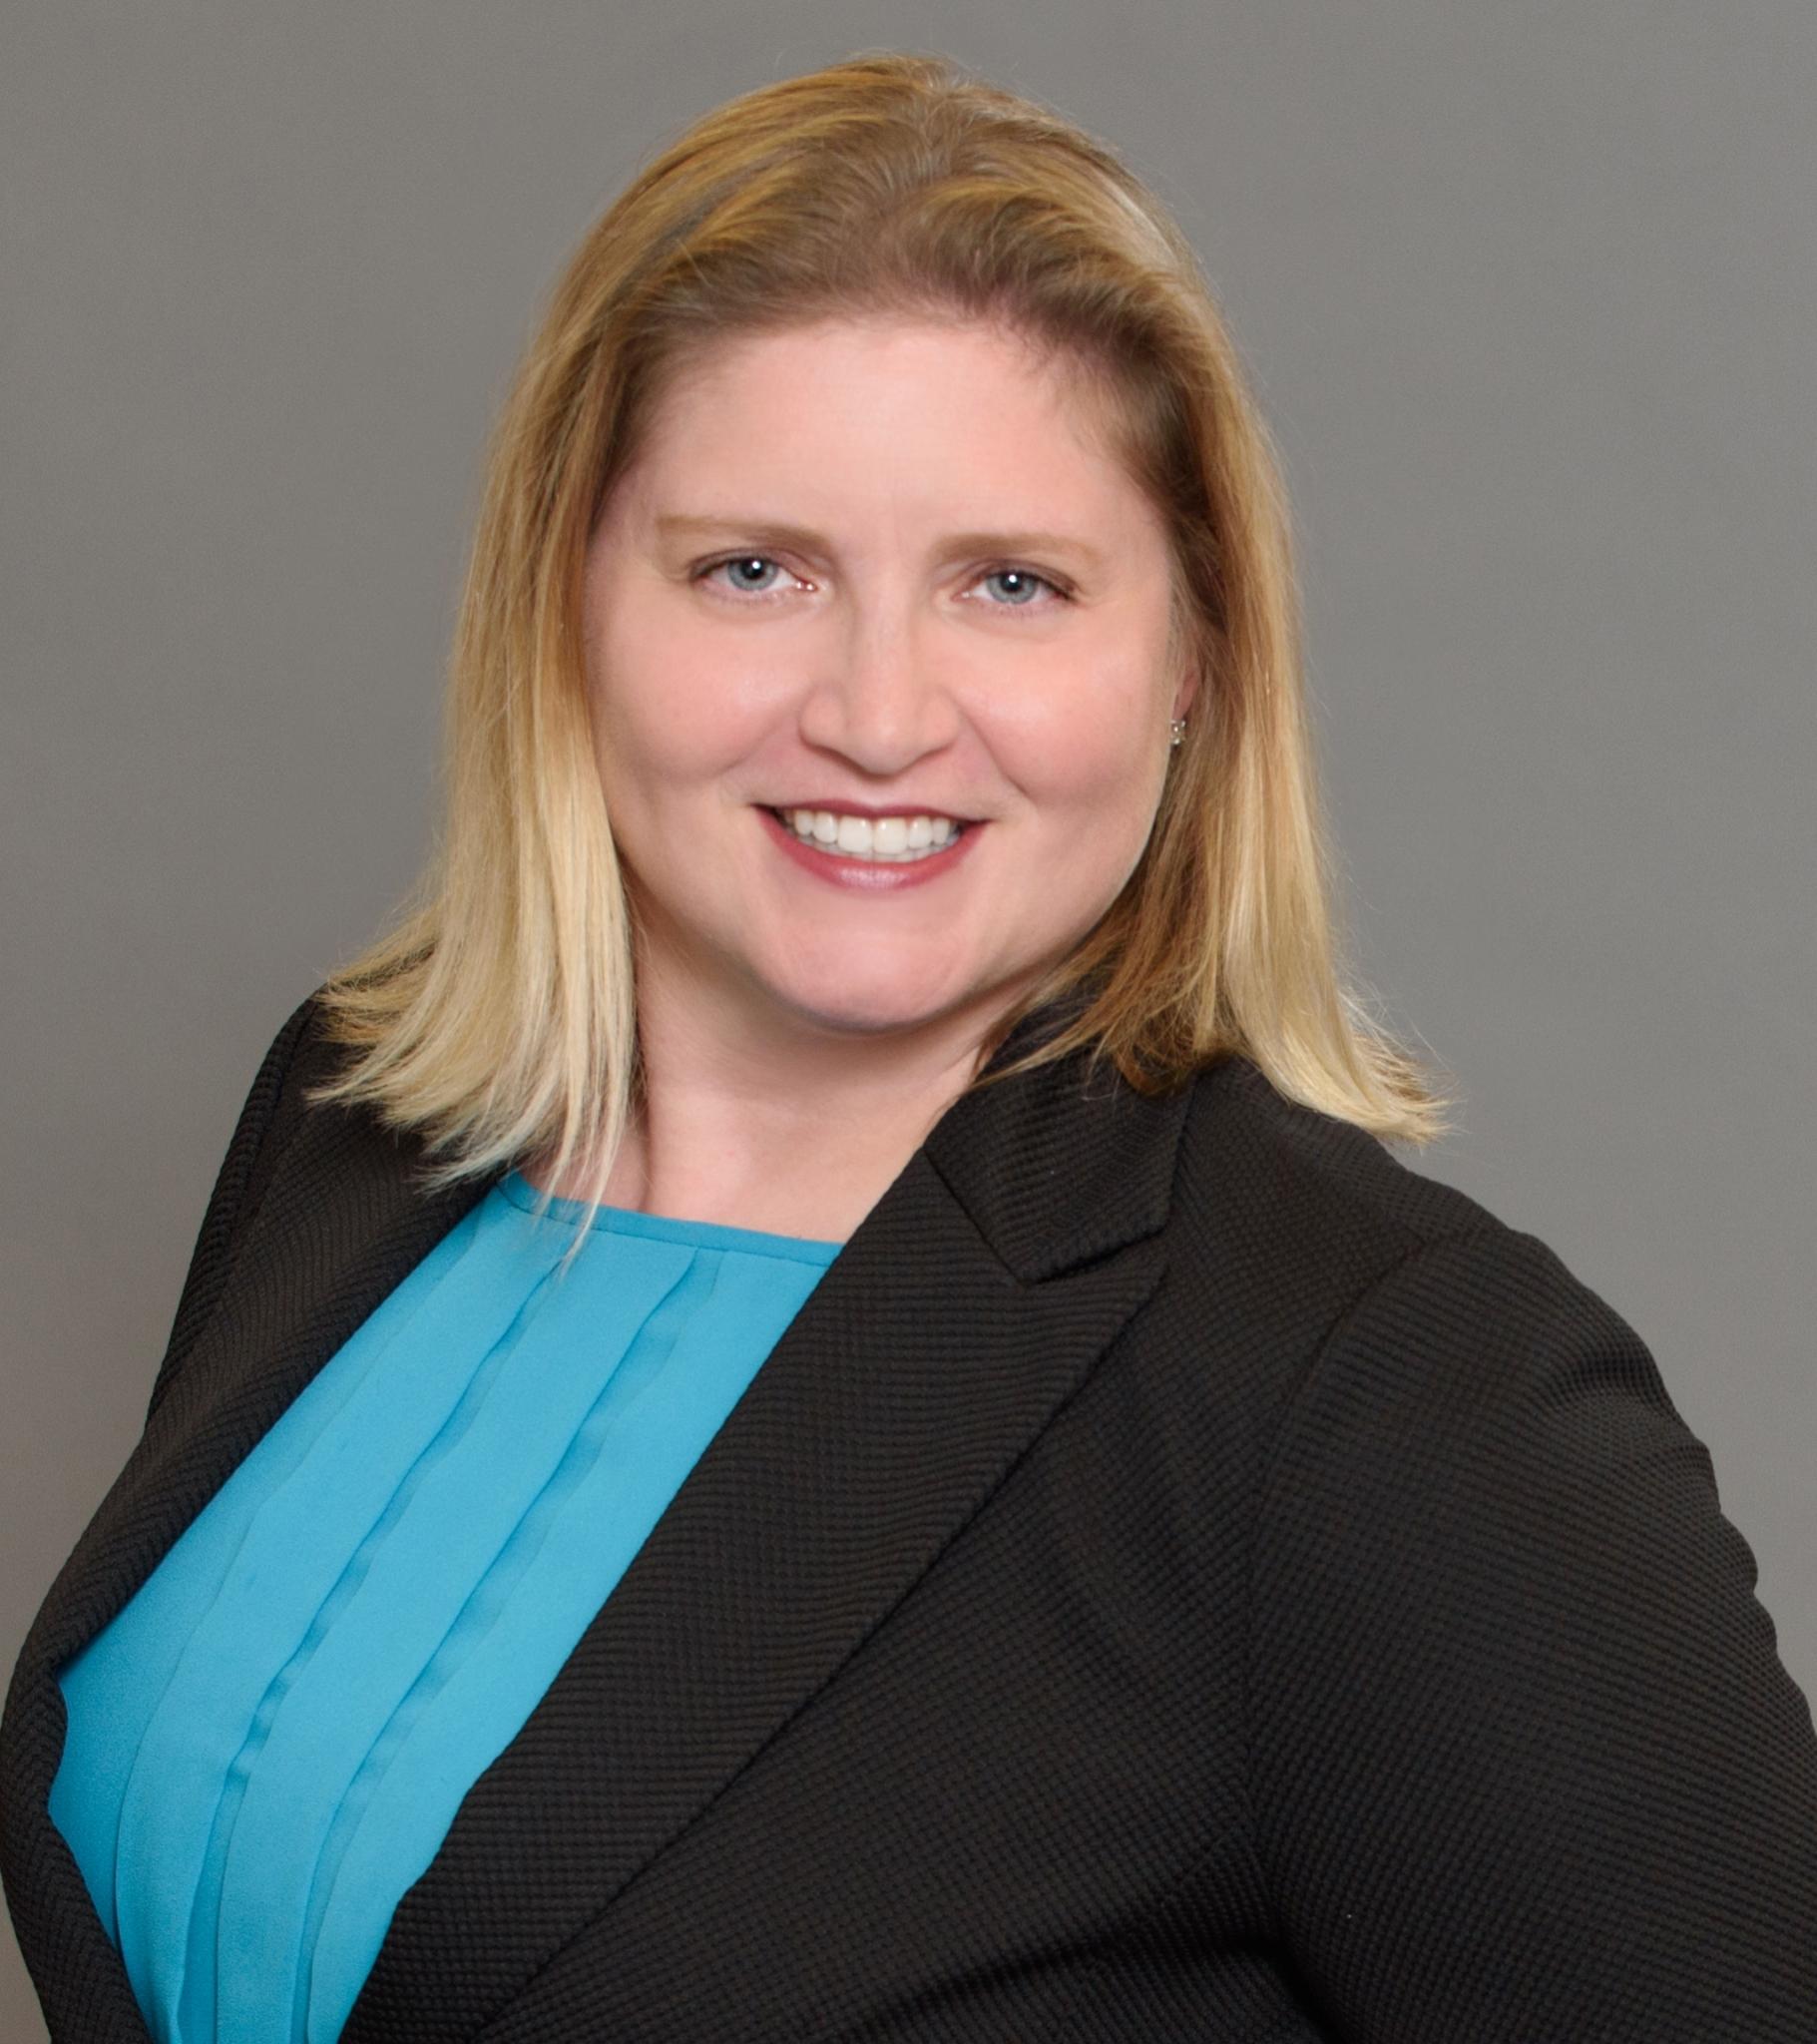 Headshot of Amelia Pellegrin, Director of Sustainable Development